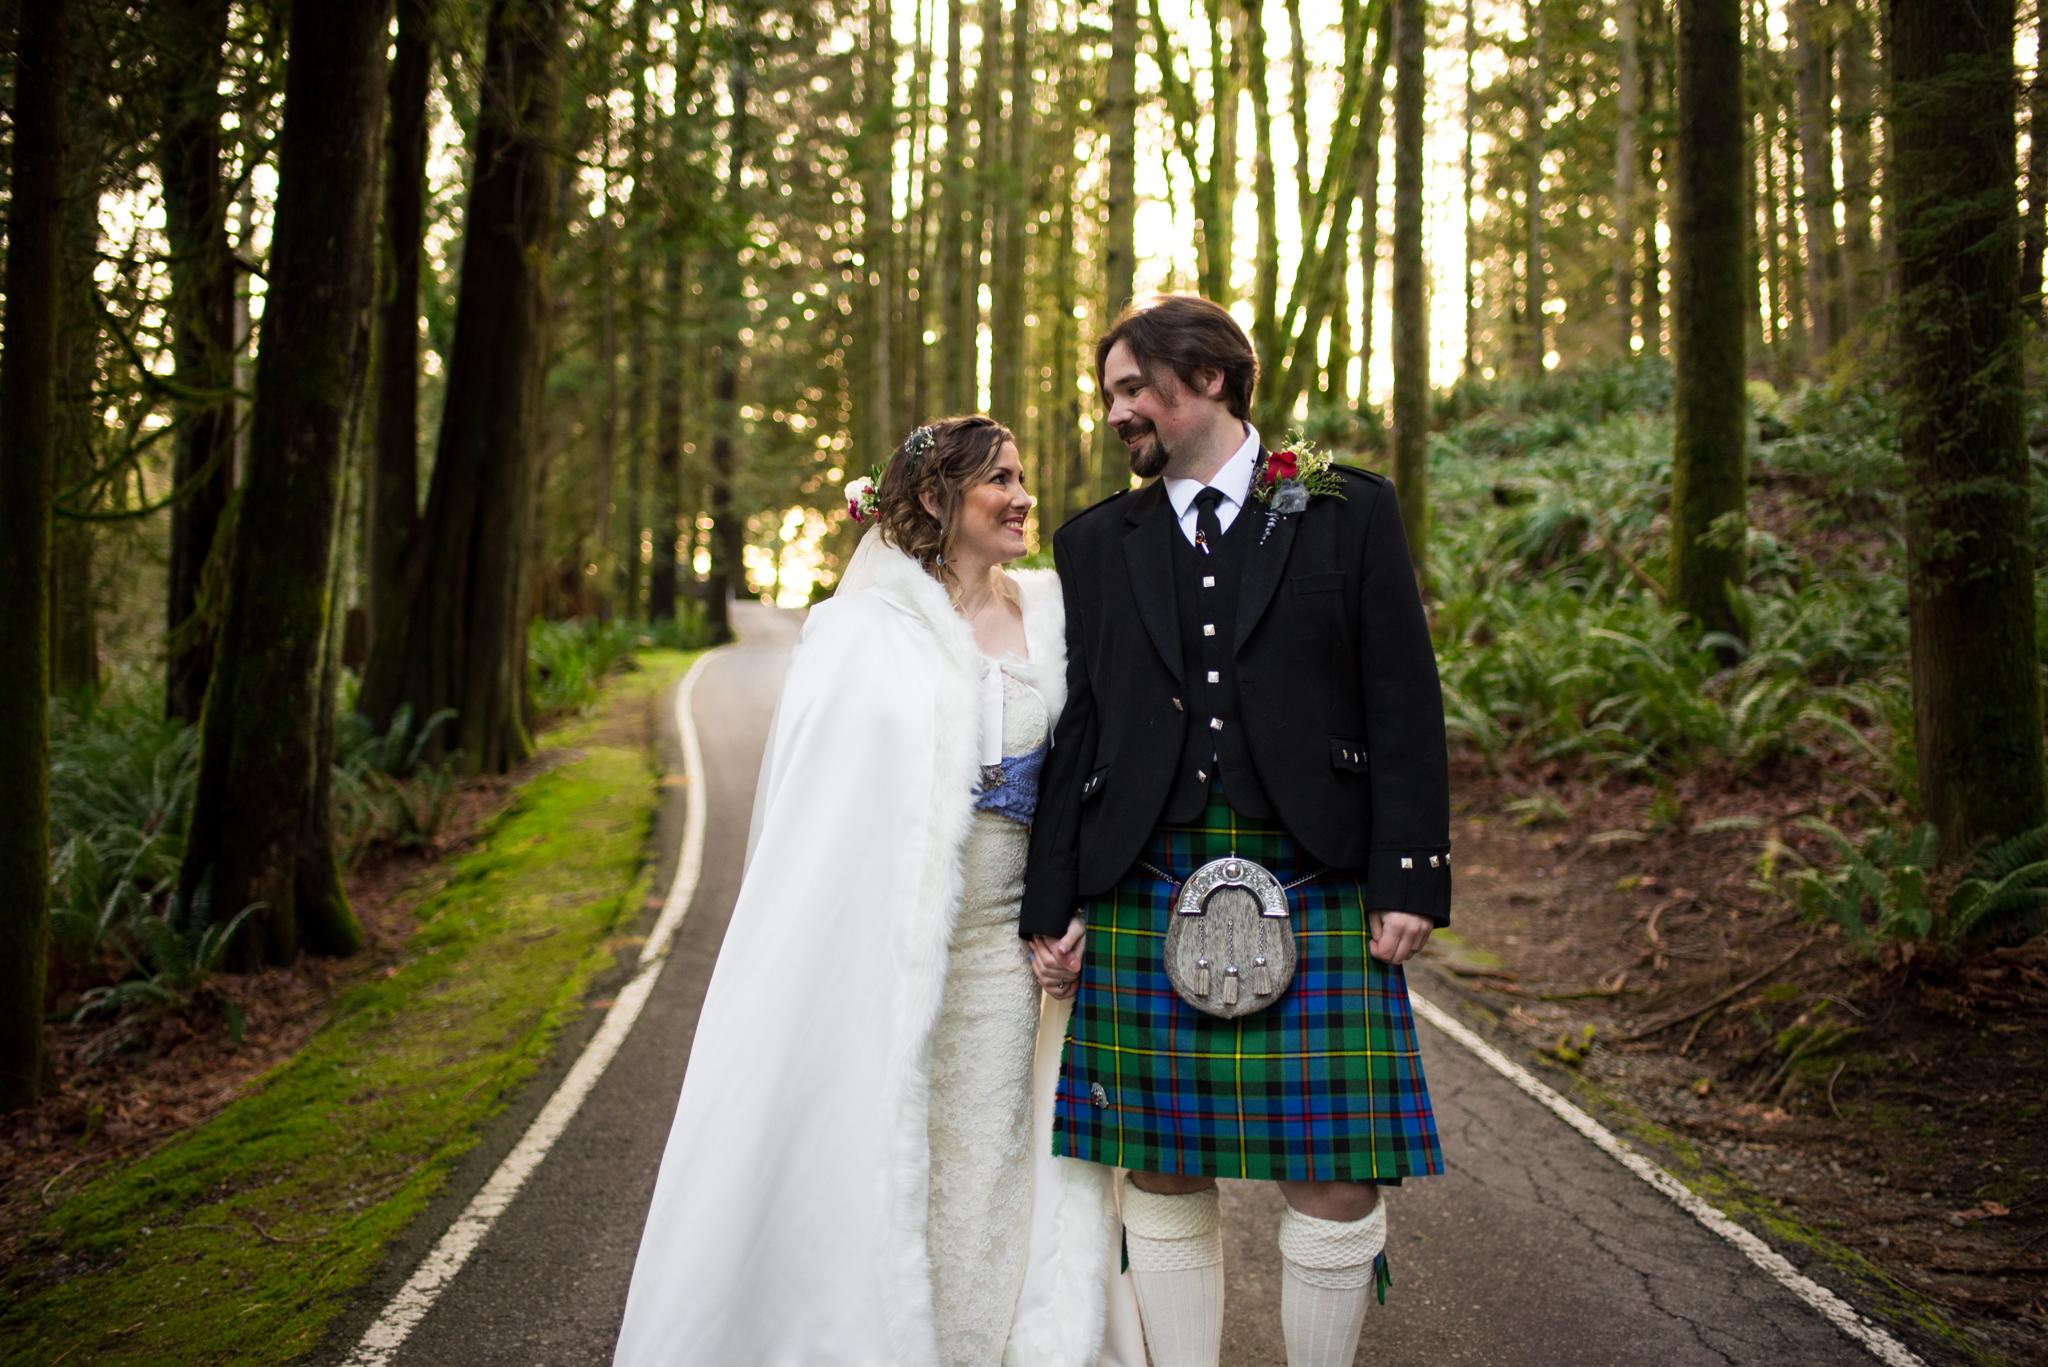 Fraser-River-Lodge-Wedding-58.JPG